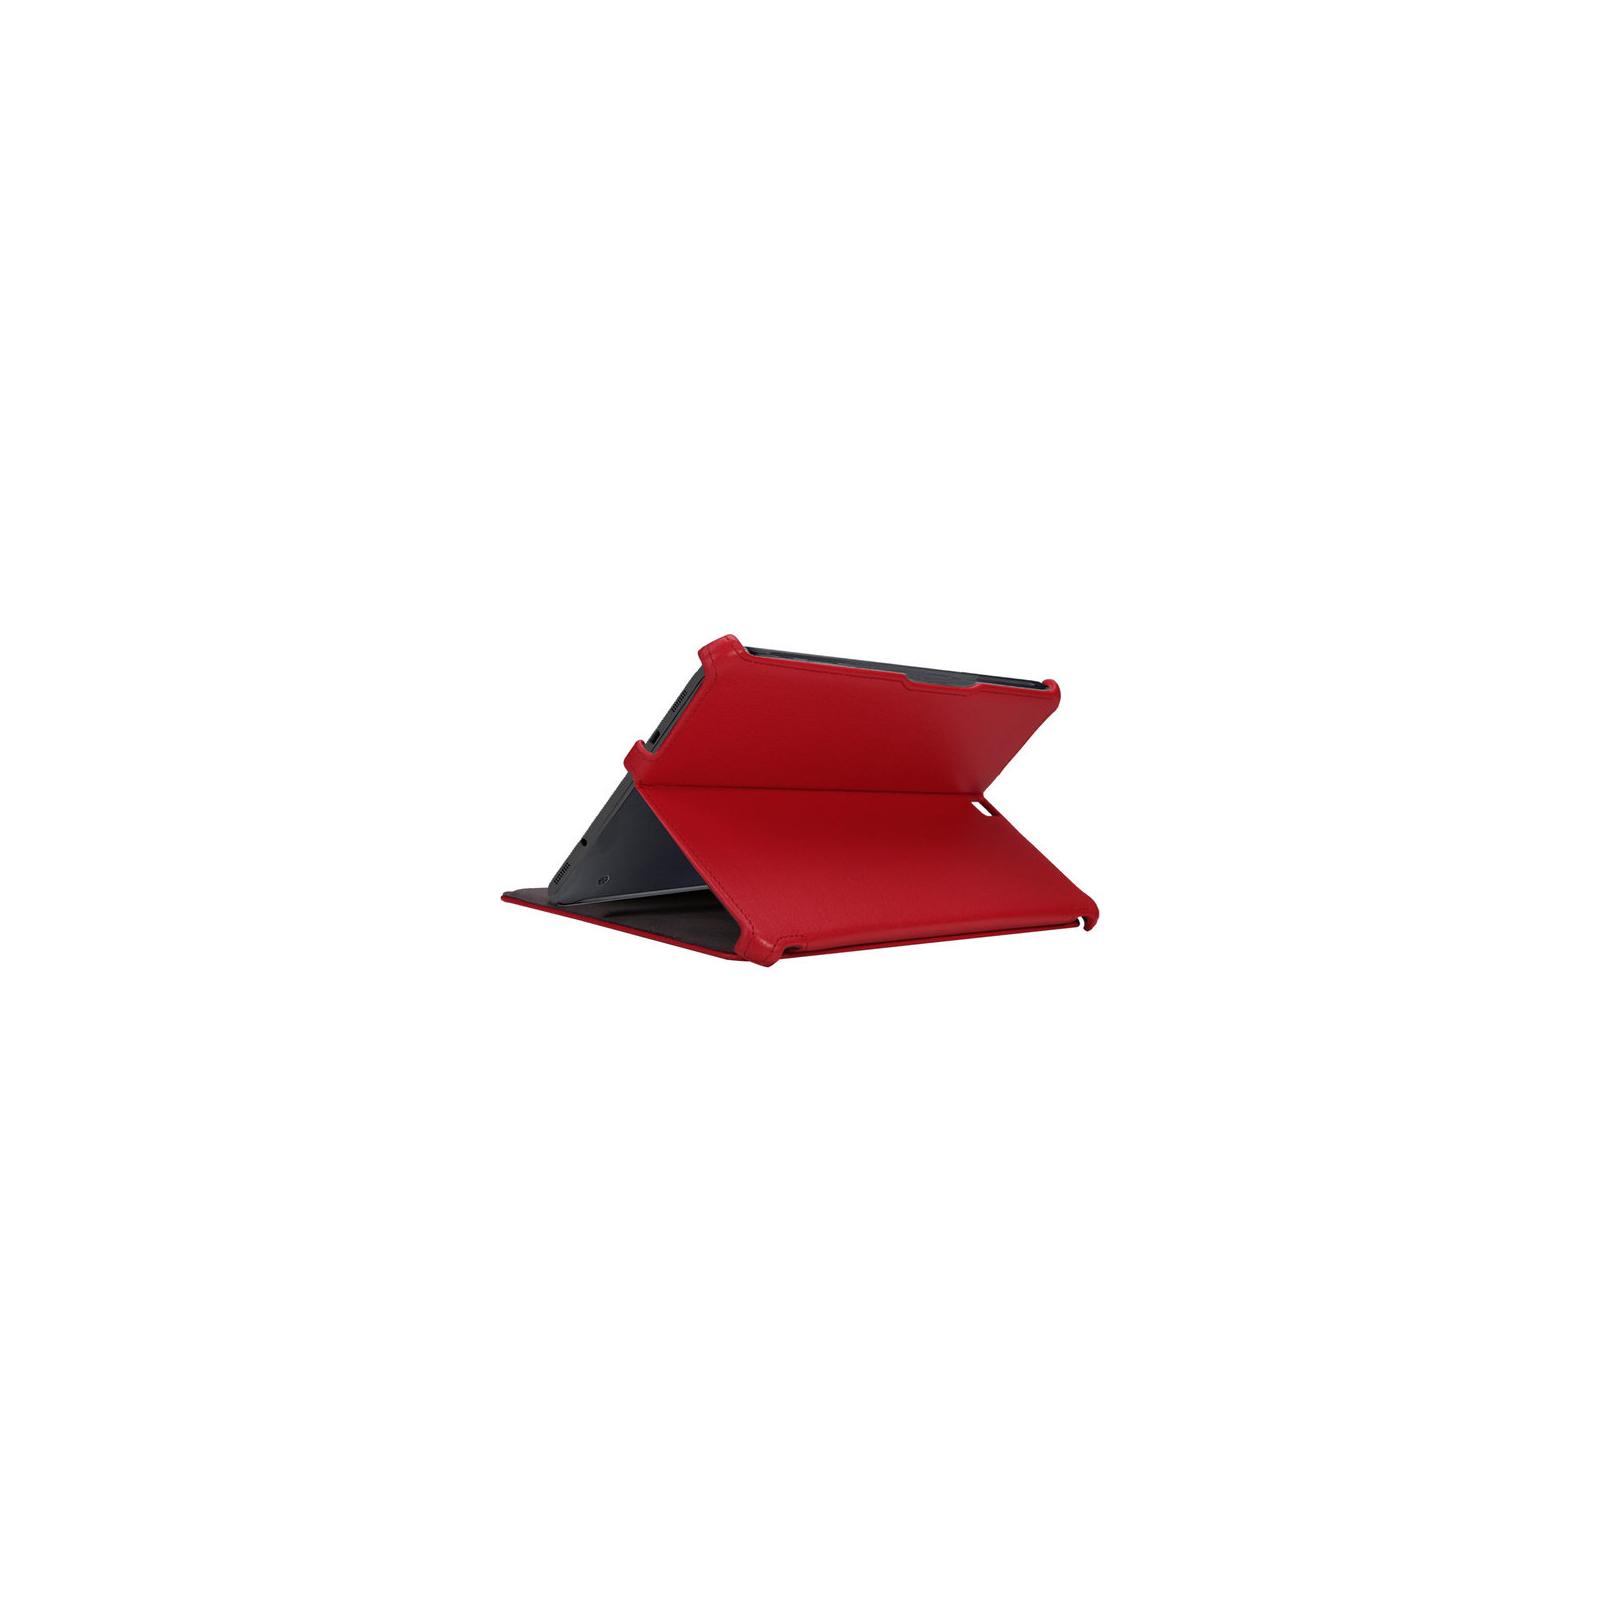 Чехол для планшета AirOn для Samsung Galaxy Tab S 2 8.0 red (4822352777524) изображение 7